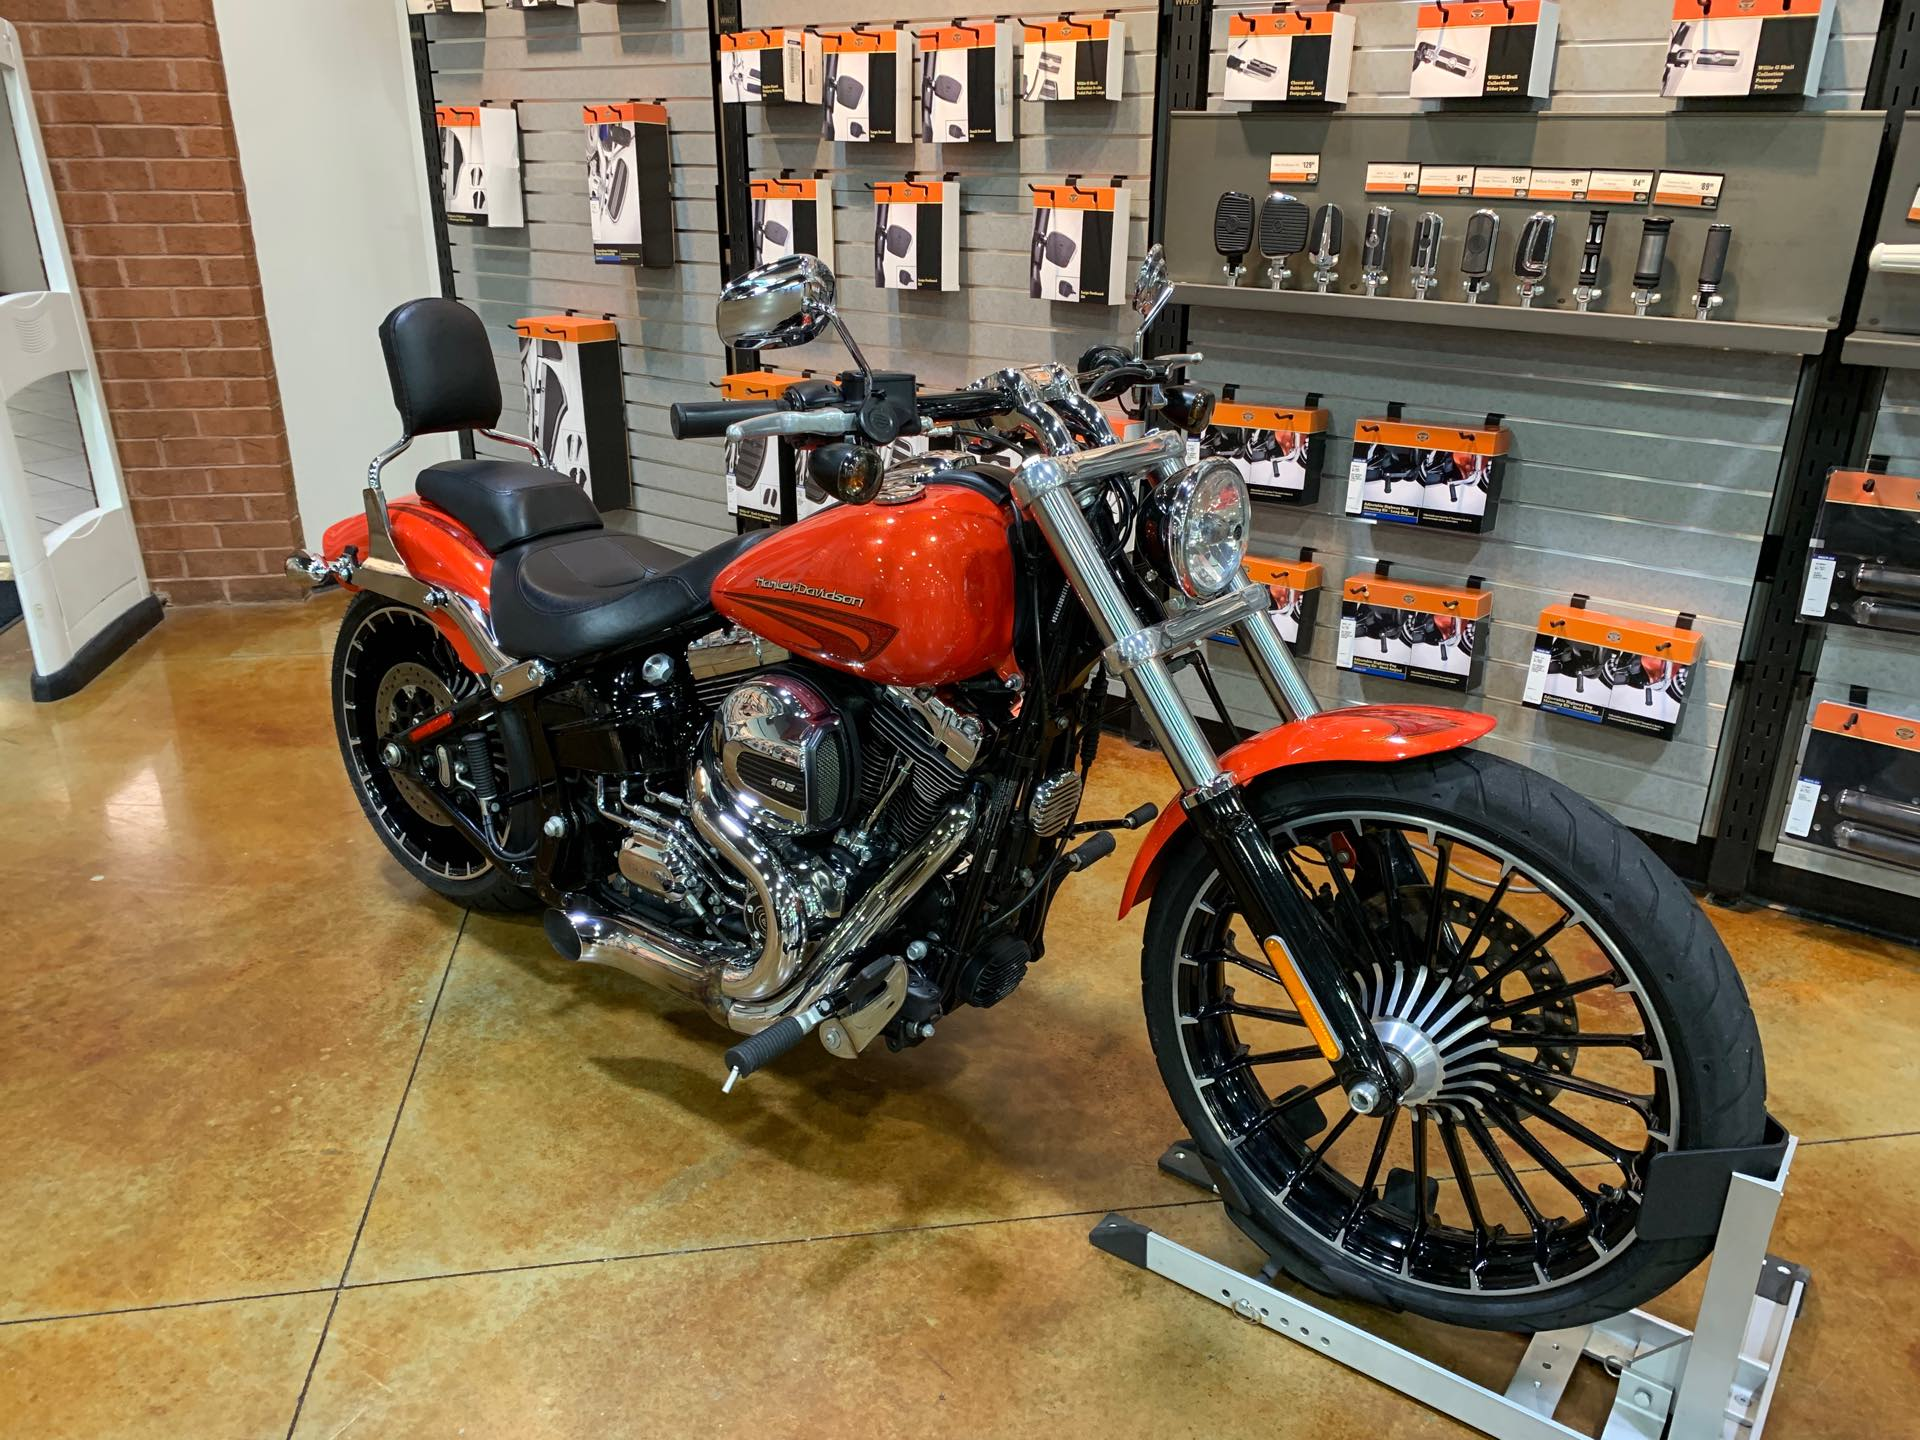 2017 Harley-Davidson Softail Breakout at Colonial Harley-Davidson